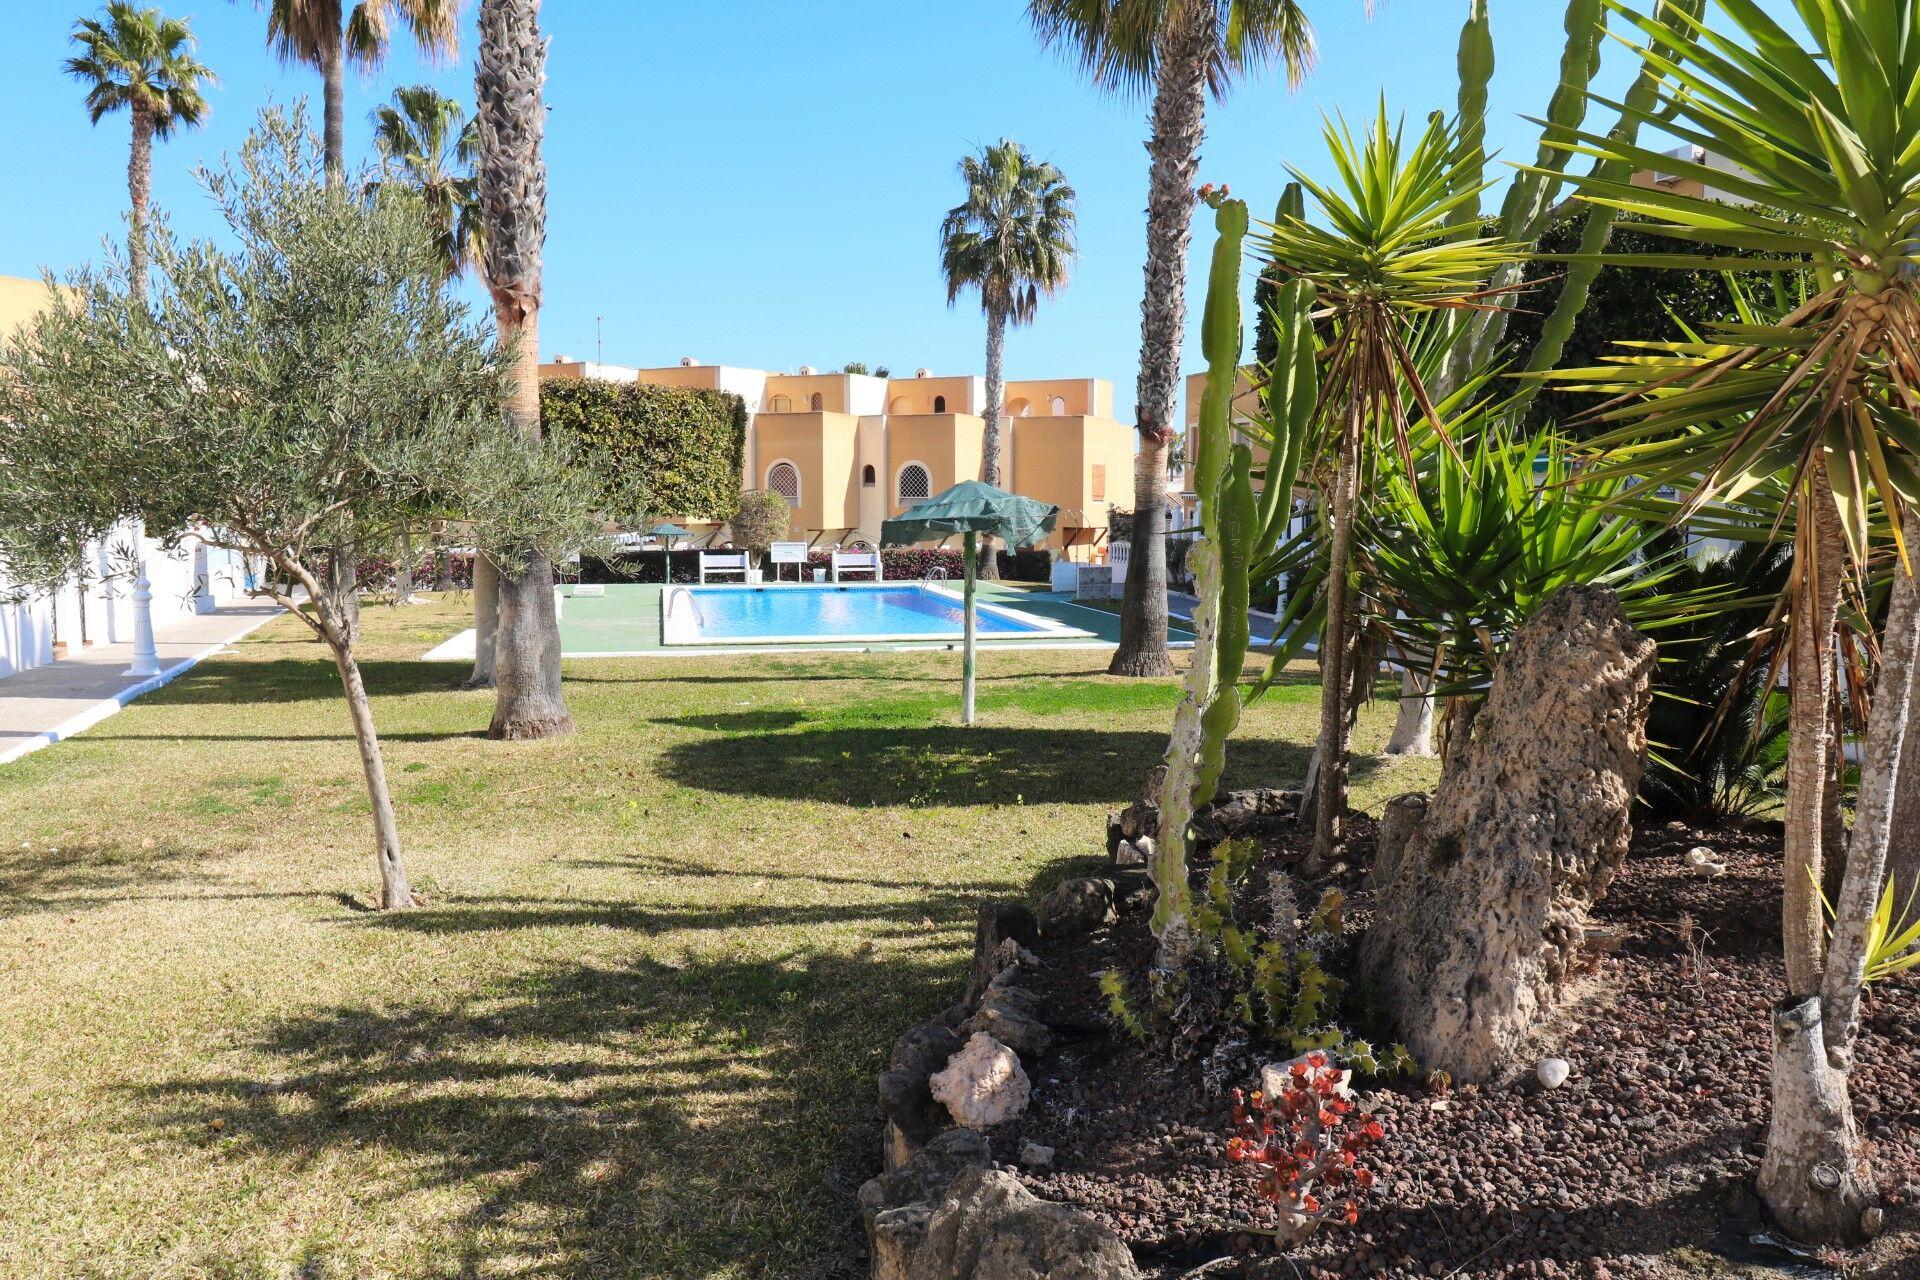 SPANIEN COSTA BLANCA La Mata,  oberer Bungalow mit Pool, Tennis, Minigolf, 800 m vom Strand